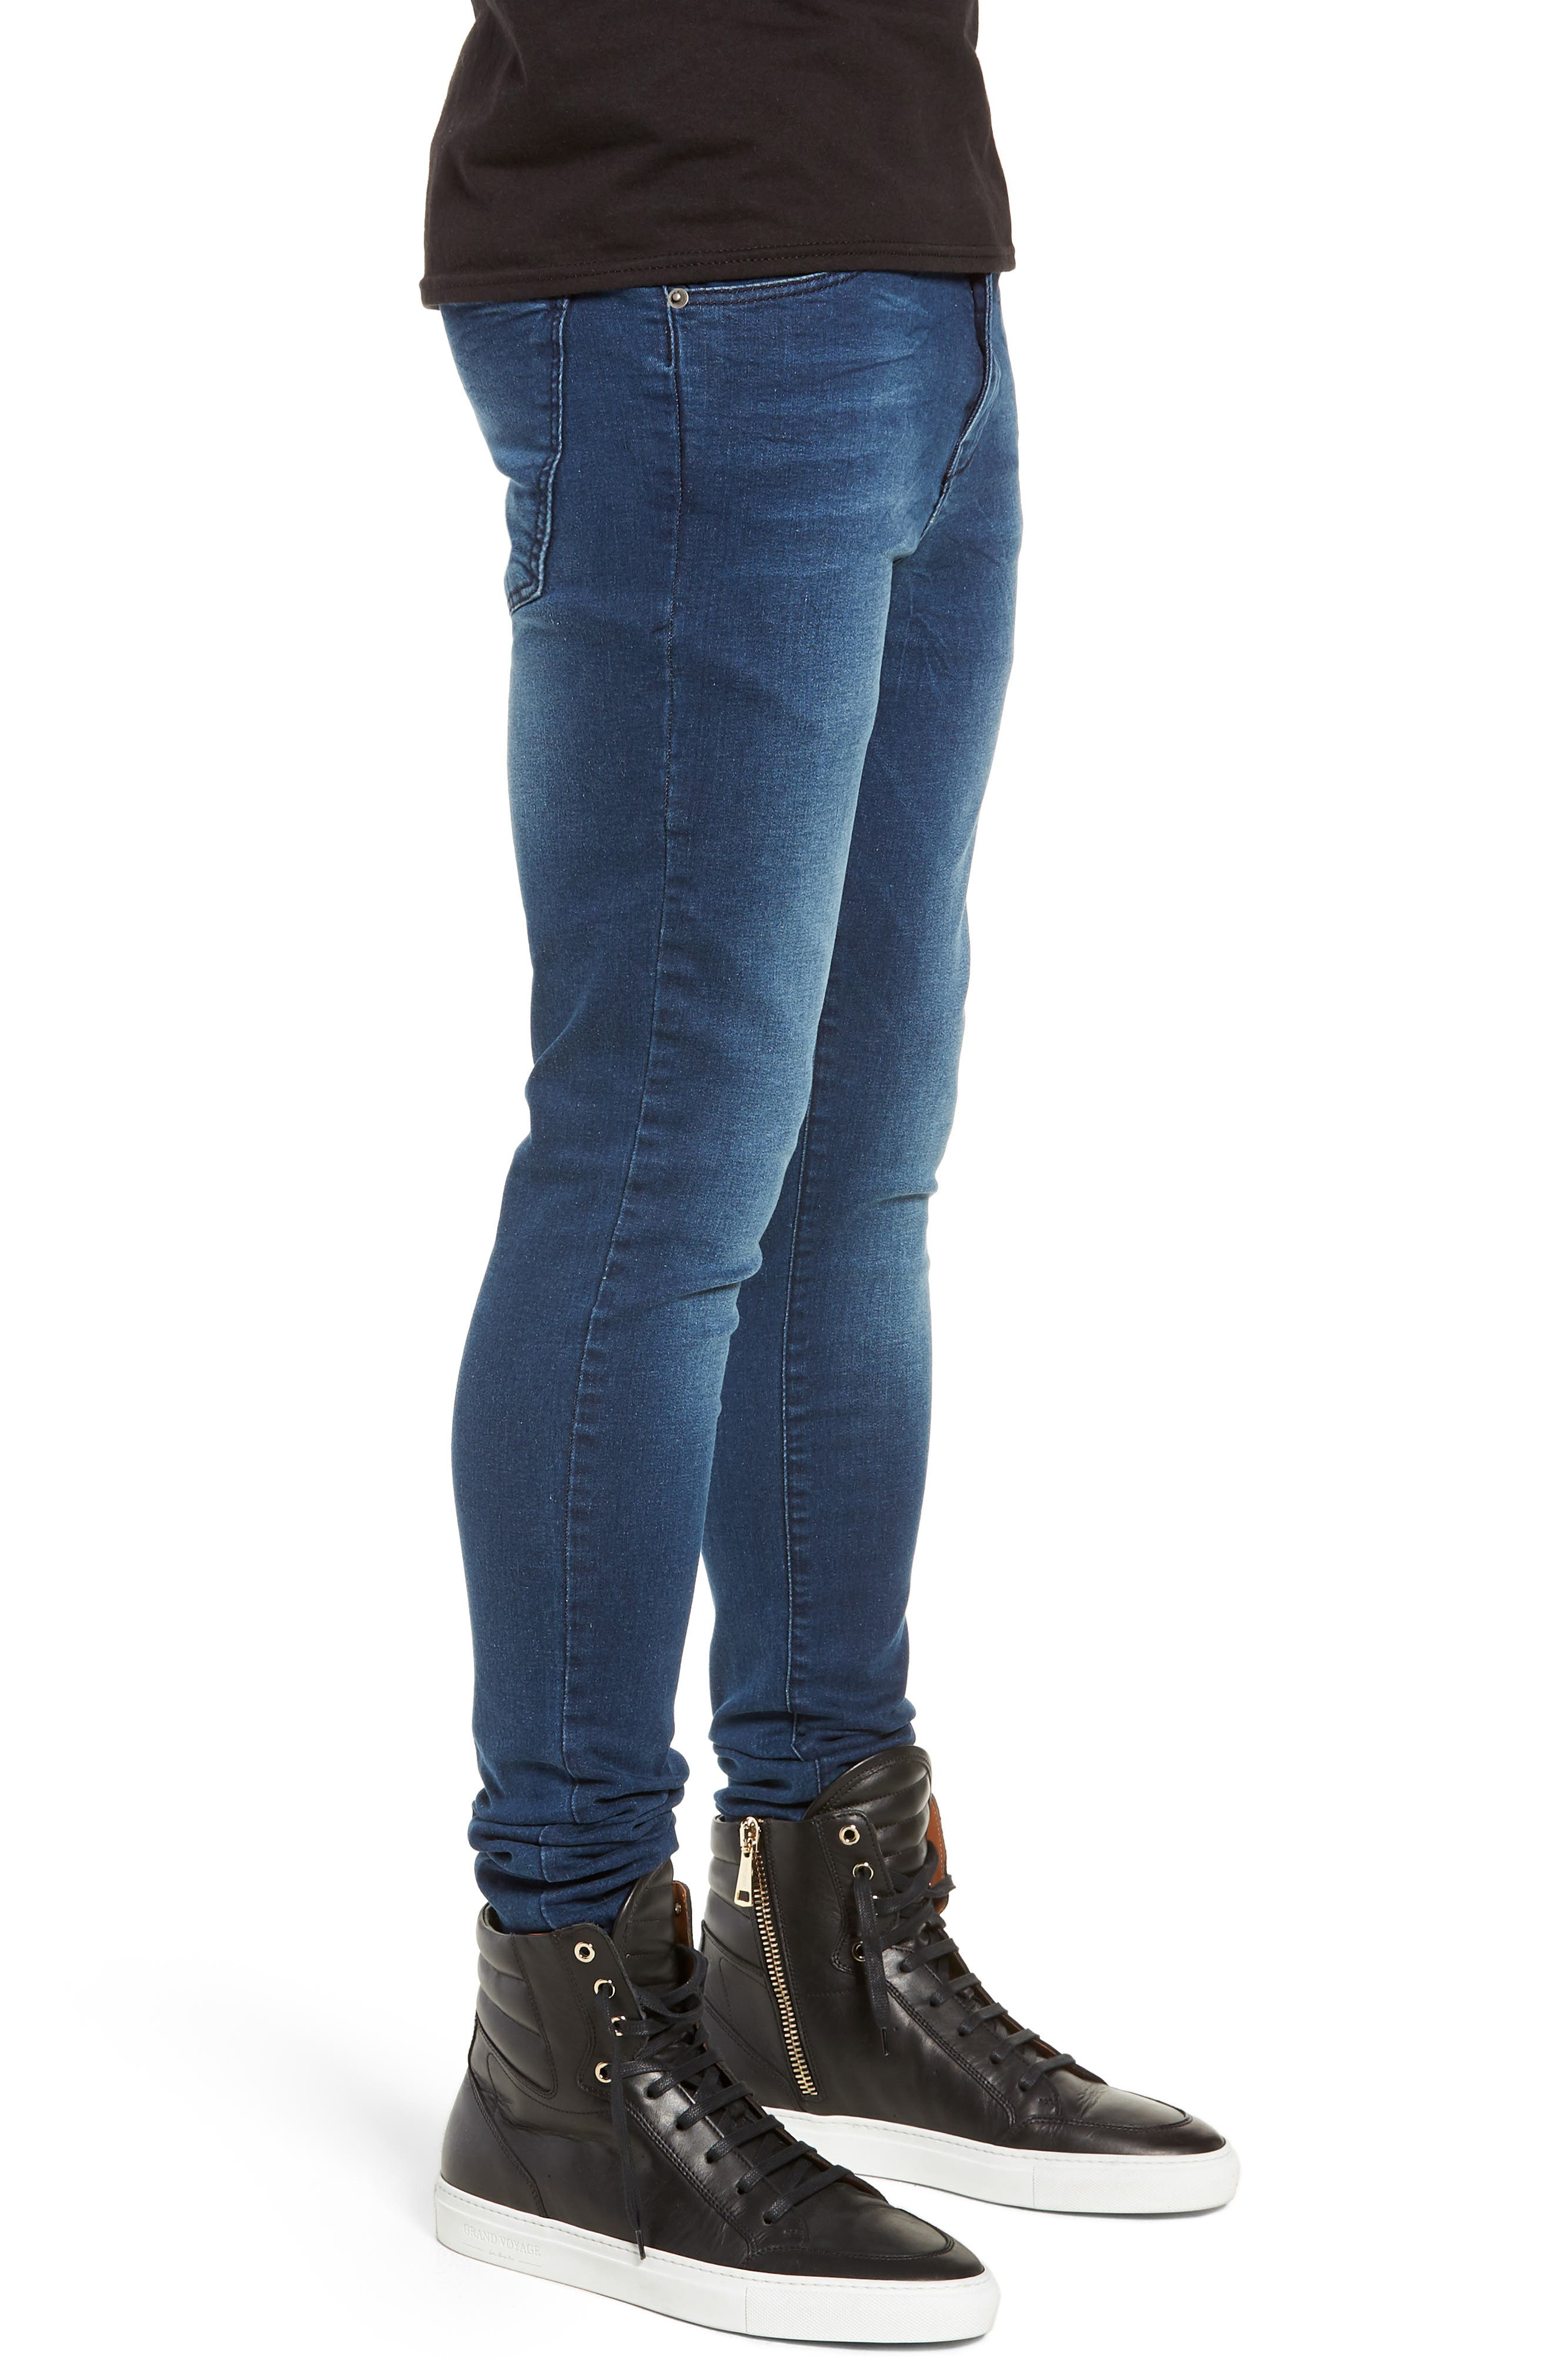 Leroy Skinny Fit Jeans,                             Alternate thumbnail 3, color,                             WORN DARK BLUE